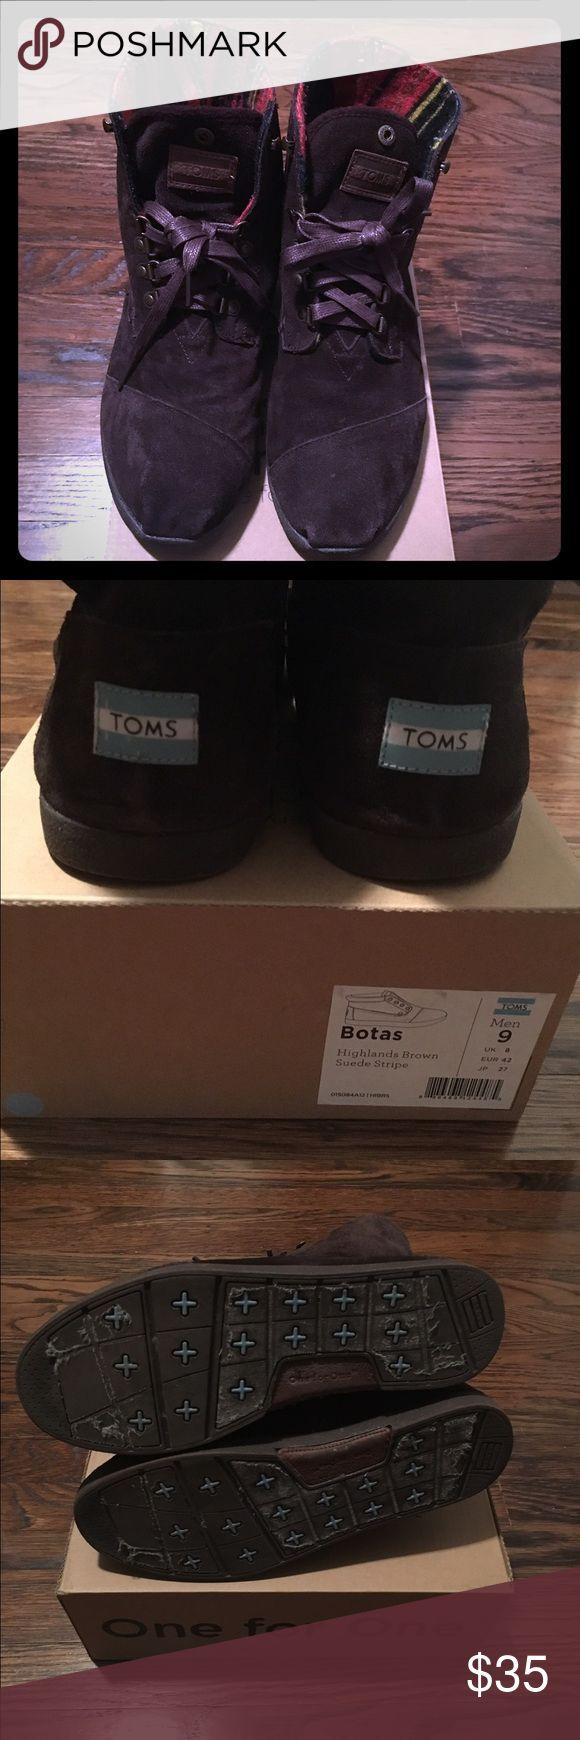 TOMS Botas Men's Shoes TOMS Botas men's size 9 shoes, good condition, worn only twice, non-smoking home. TOMS Shoes Boots